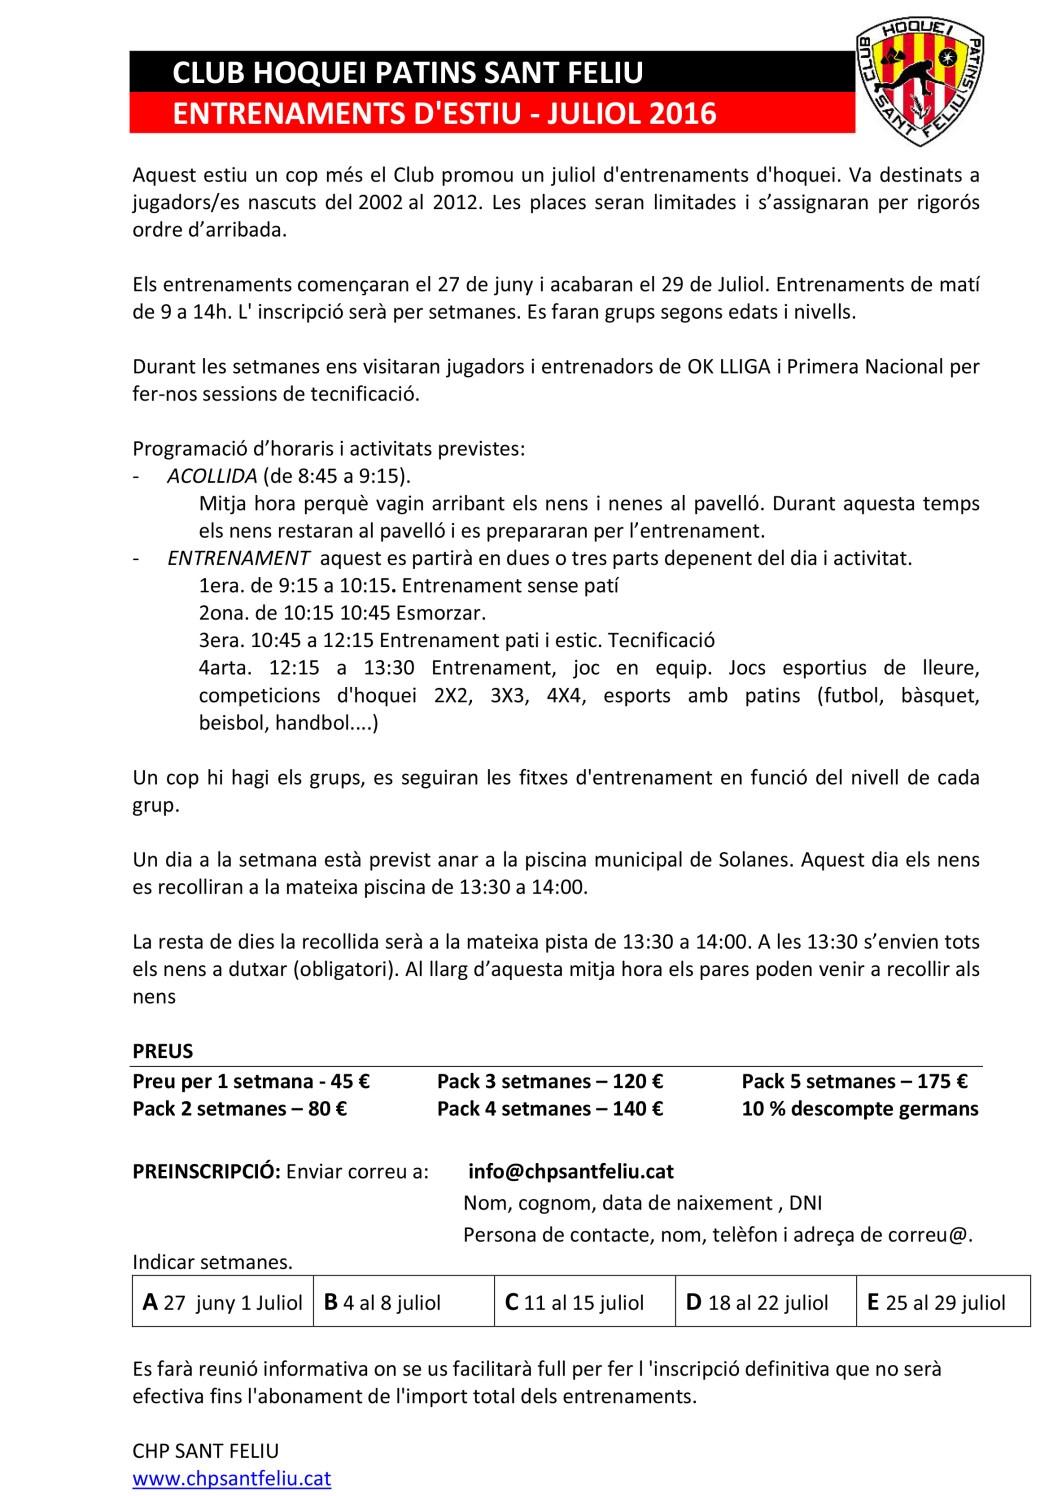 Microsoft Word - CampusEstiu2016_CHPSF.doc